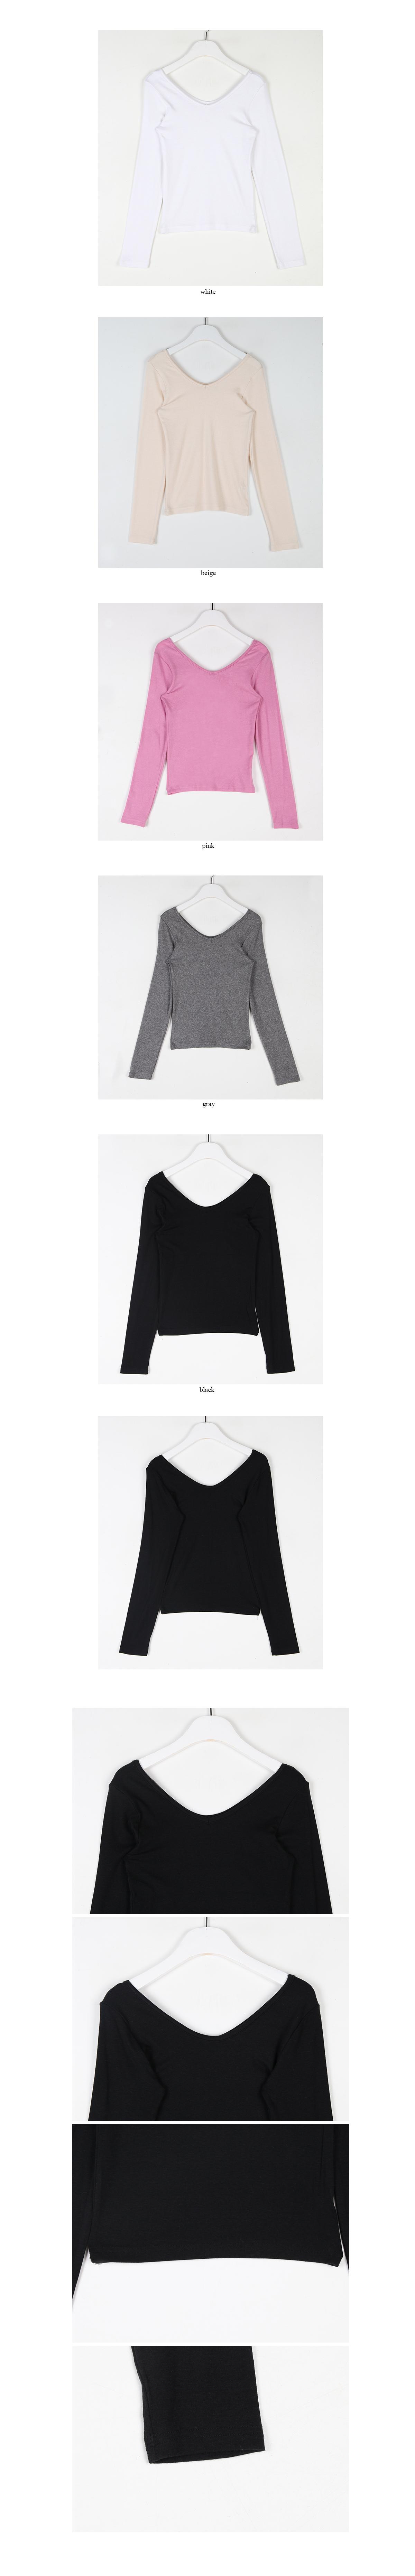 maron t-shirt (5colors)